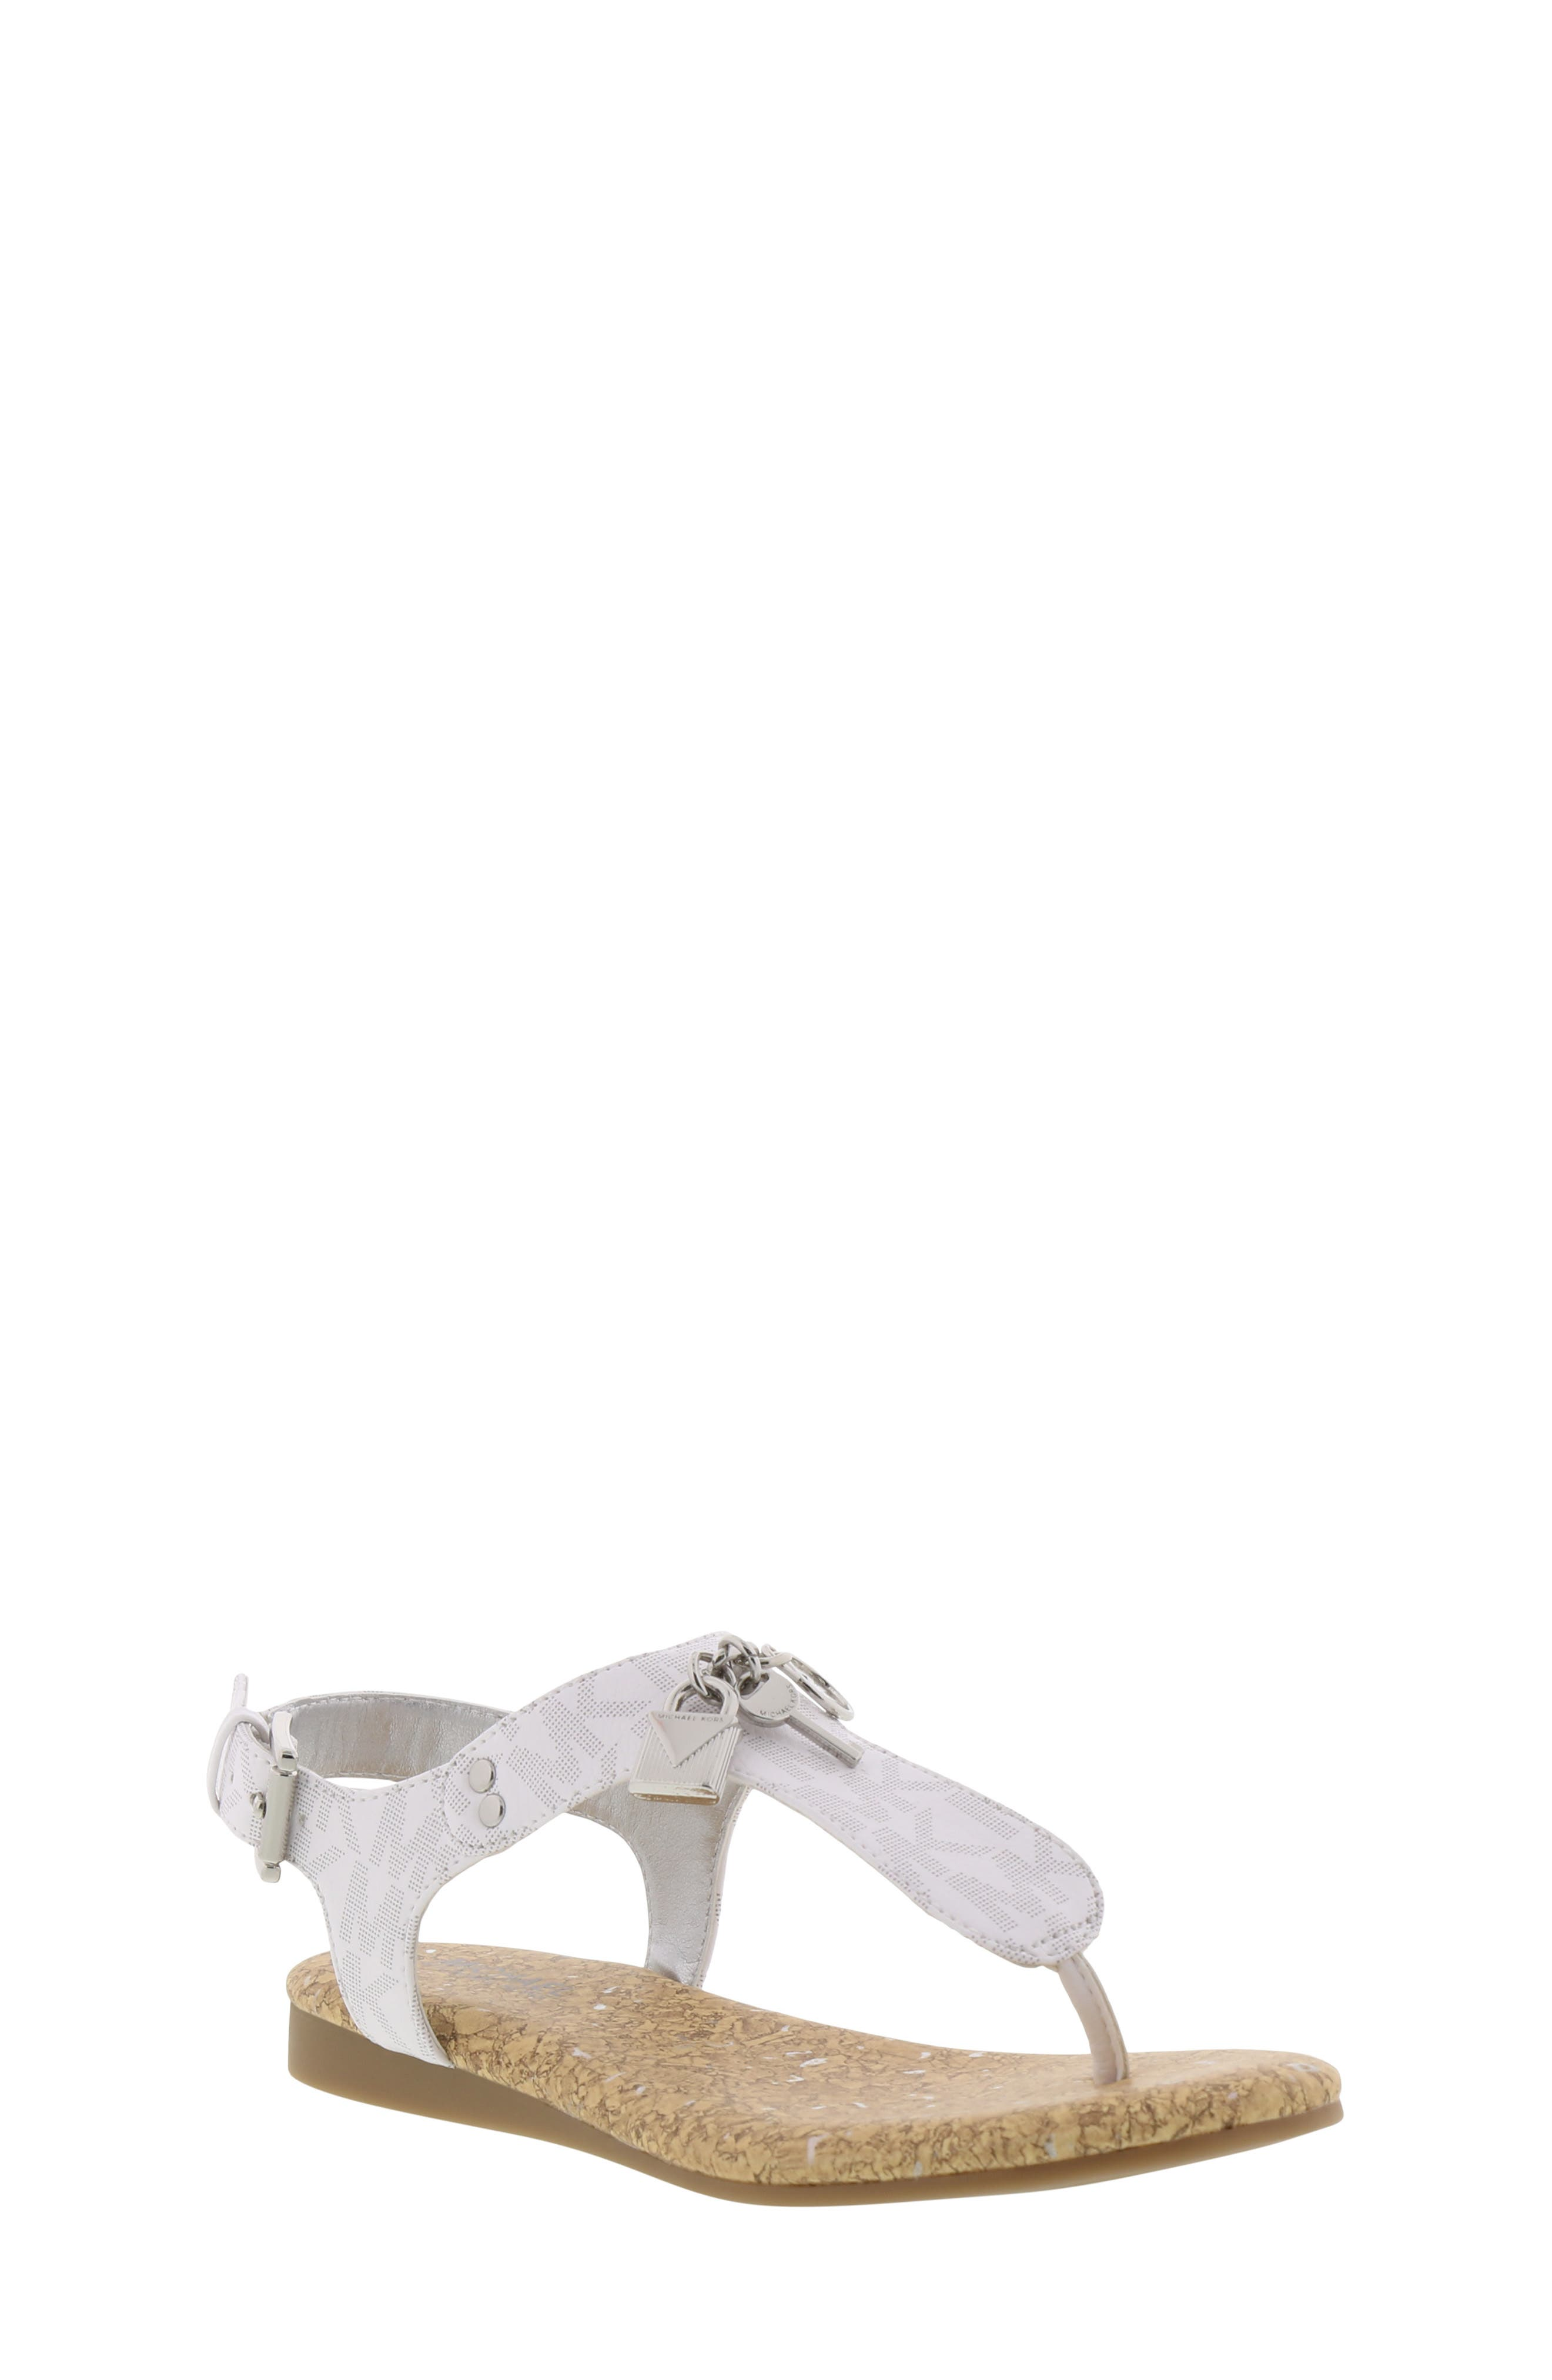 MICHAEL MICHAEL KORS Tilly Cora Charm T-Strap Sandal, Main, color, WHITE LOGO